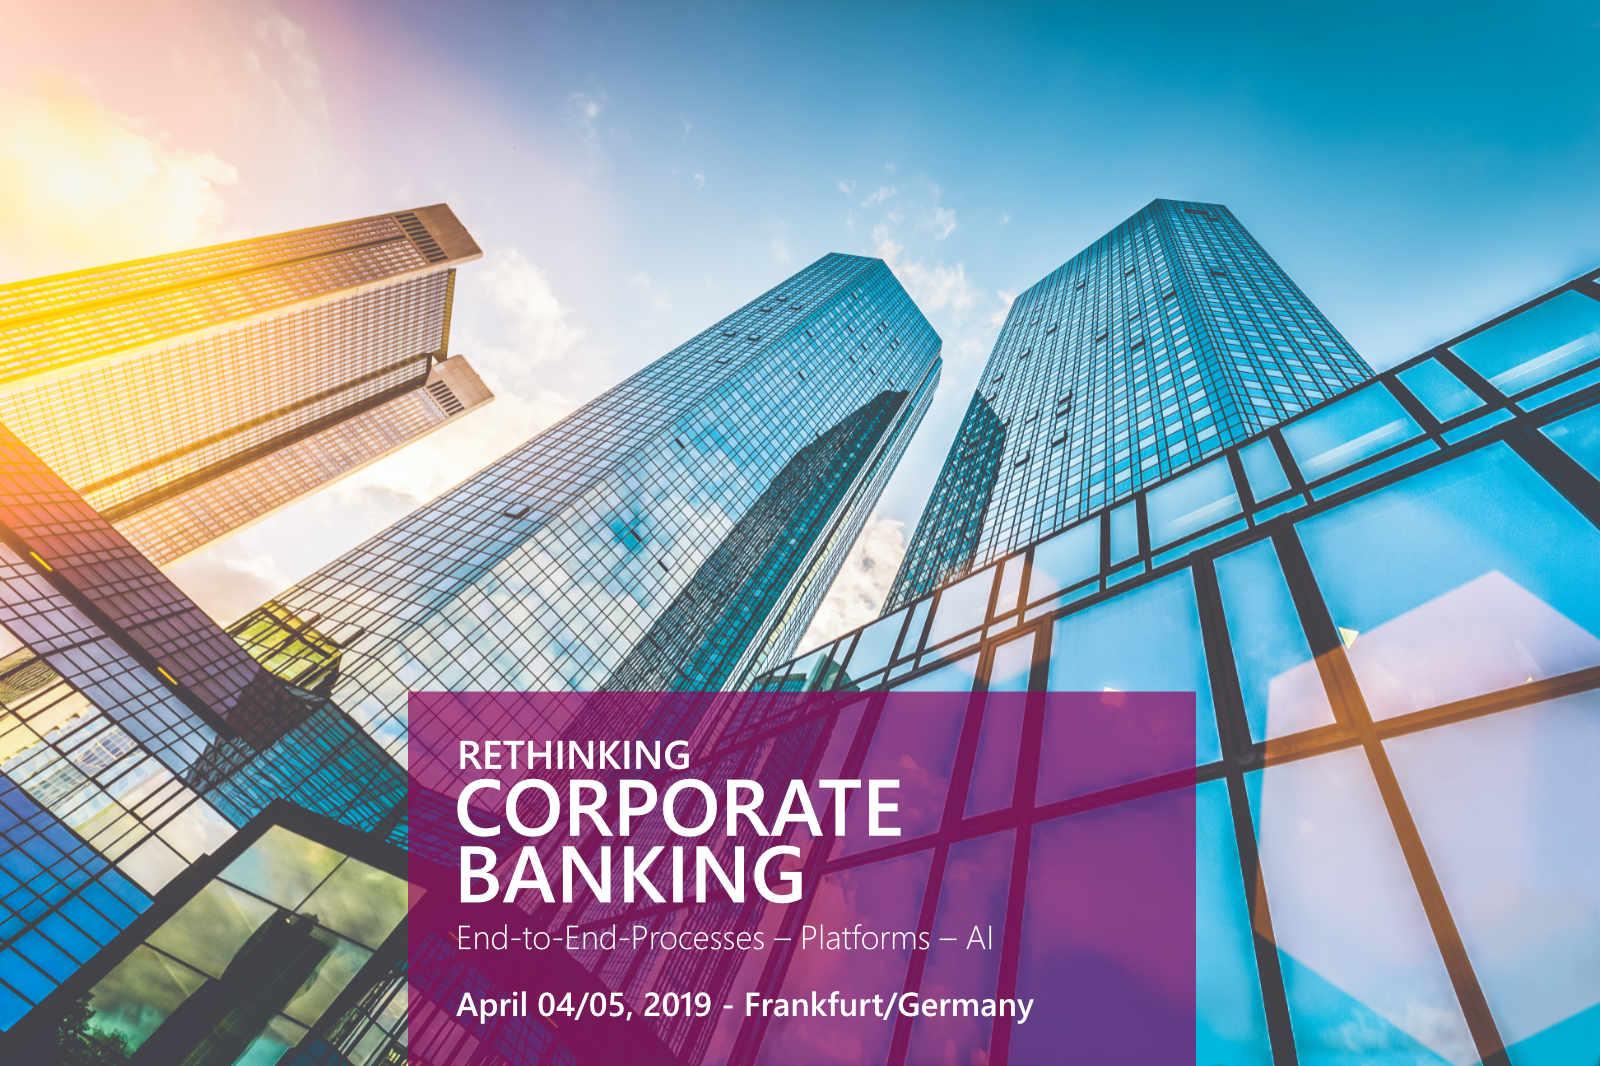 Rethinking_Corporate_Banking_2019_EN